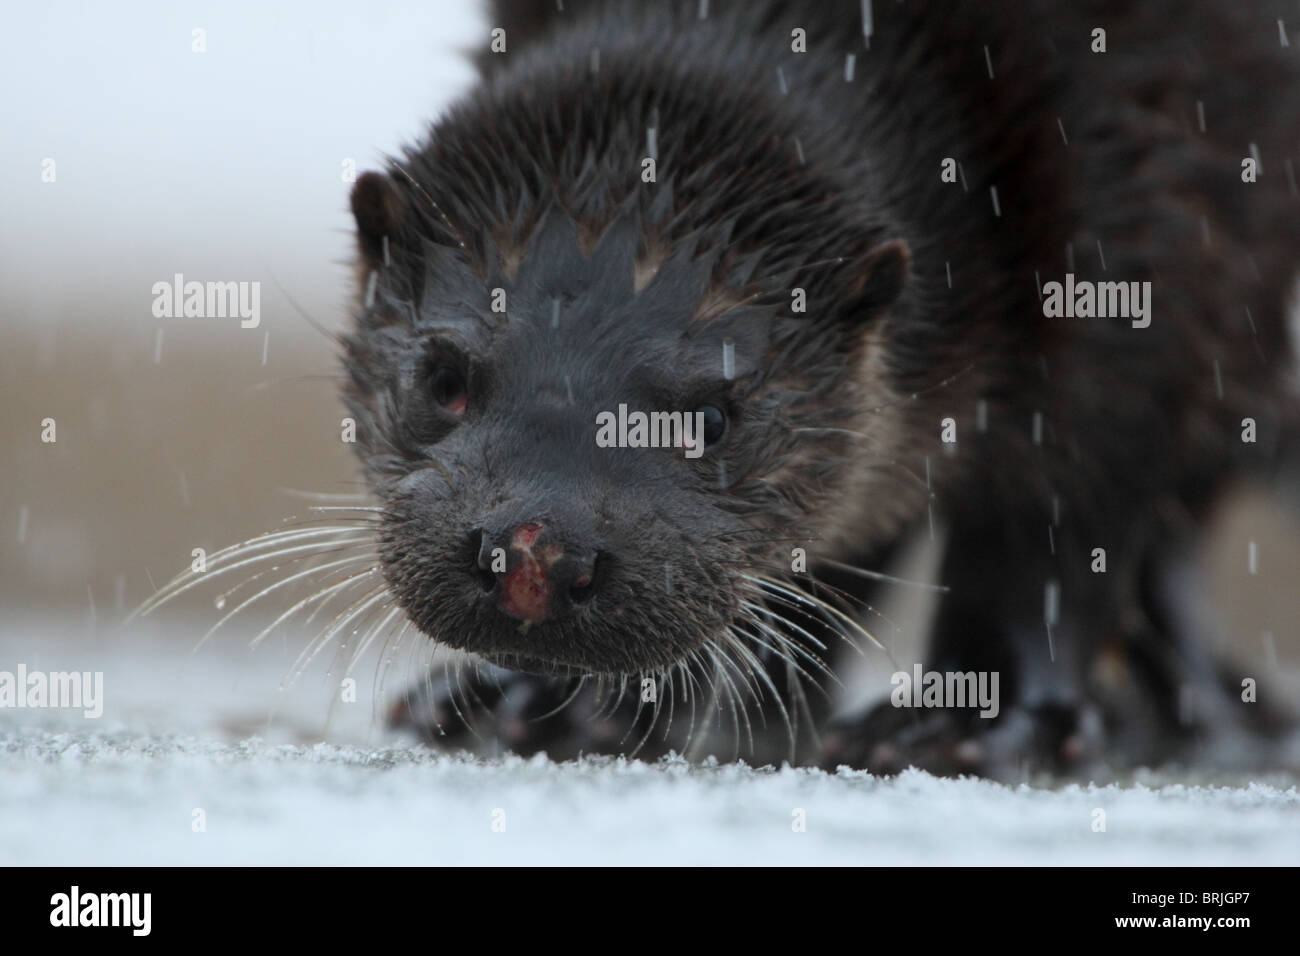 Wild European Otter (Lutra lutra) with injured nose. Europe, Estonia - Stock Image